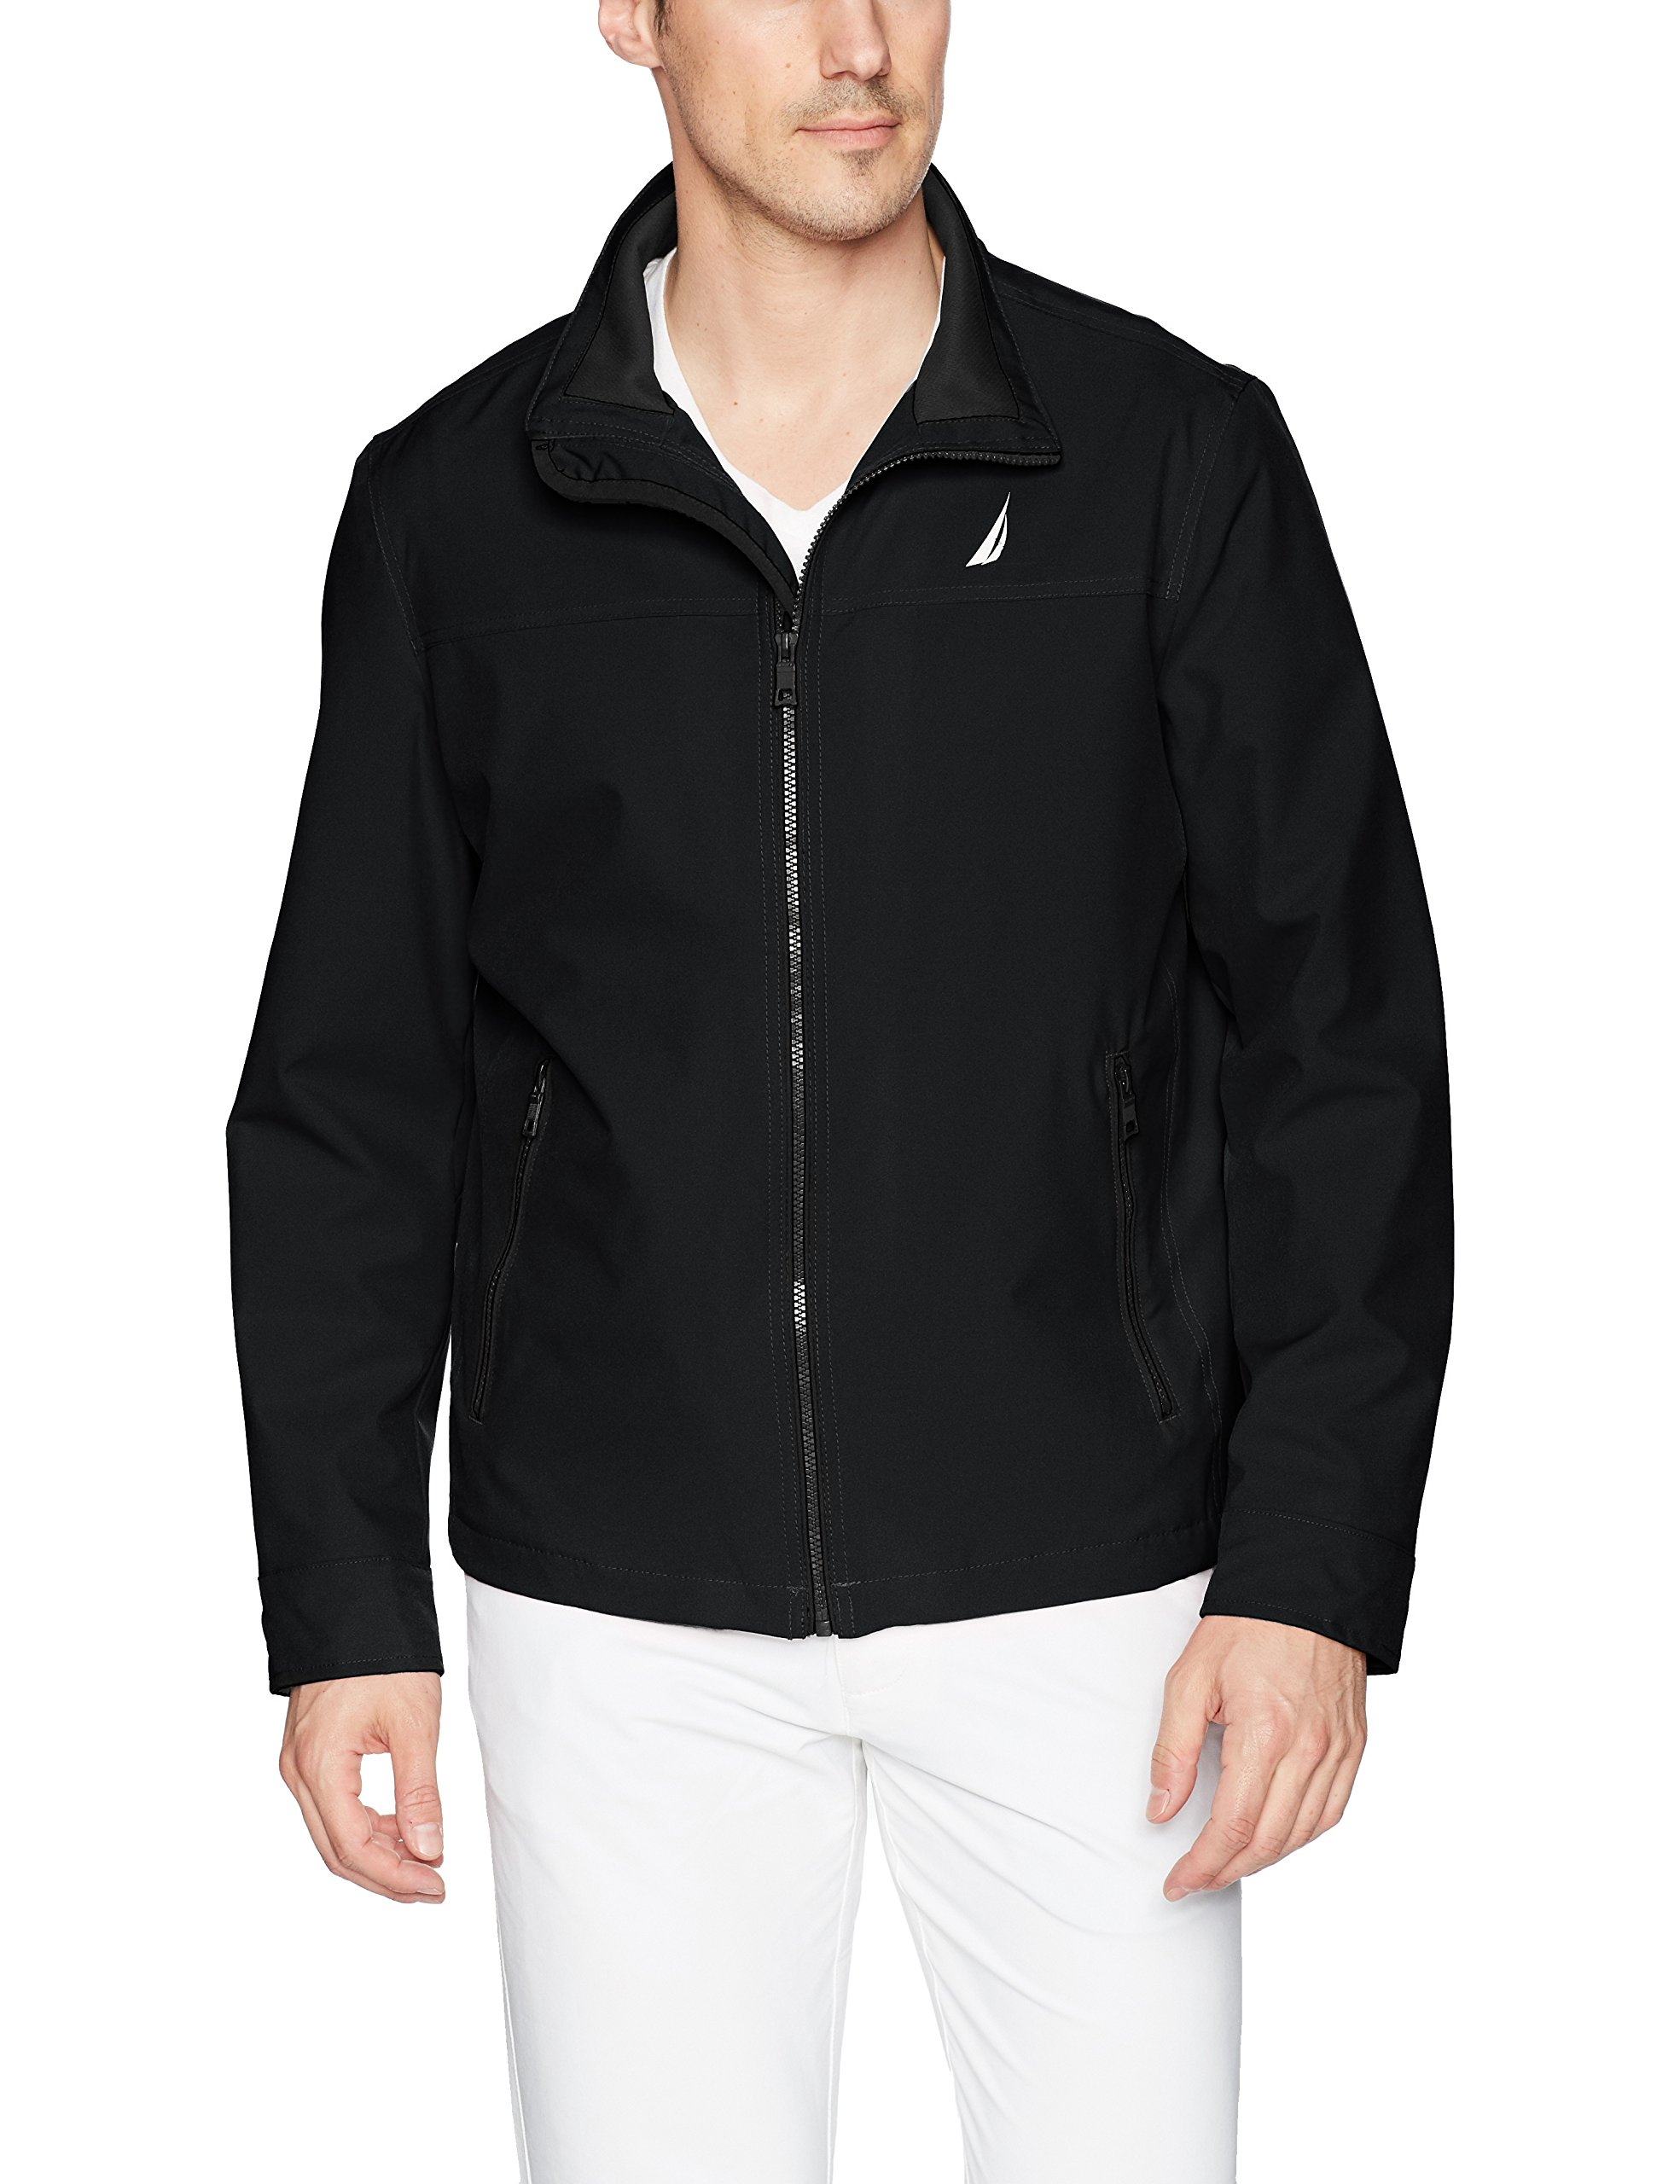 Nautica Men's Lightweight Stretch Golf Jacket, Deep Black, L by Nautica